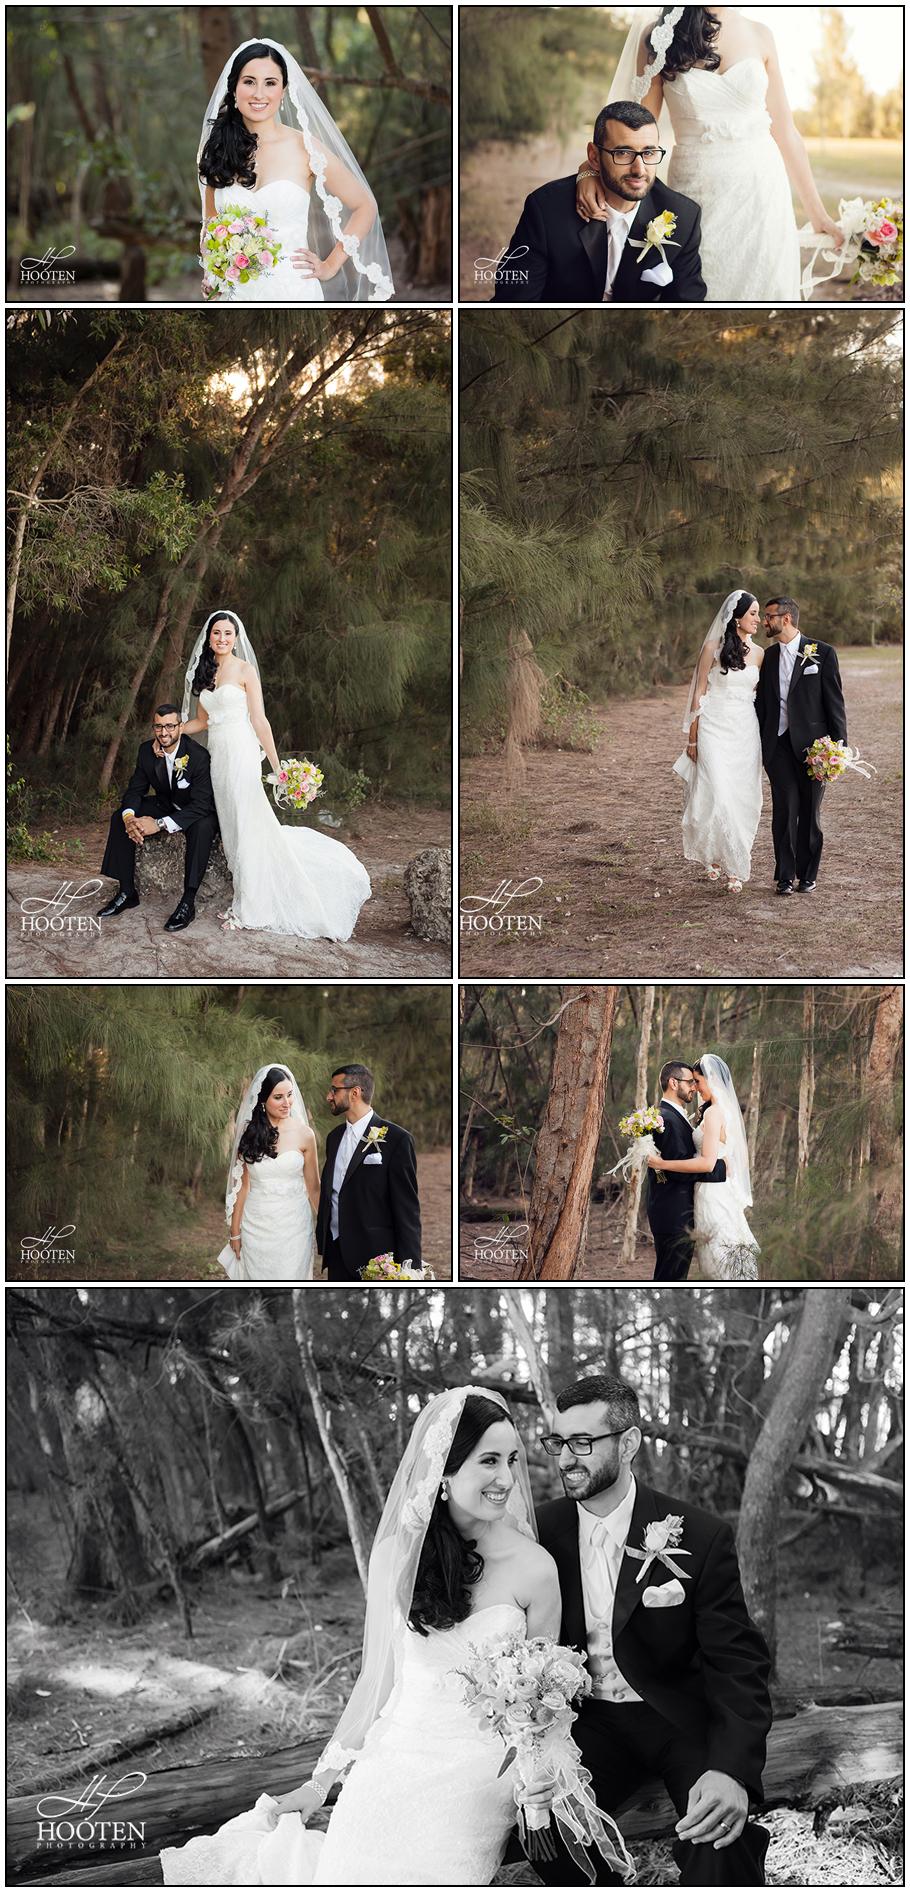 Miami-Wedding-Photography-Spring-Wedding-South-Florida-Photographer-Photo.jpg